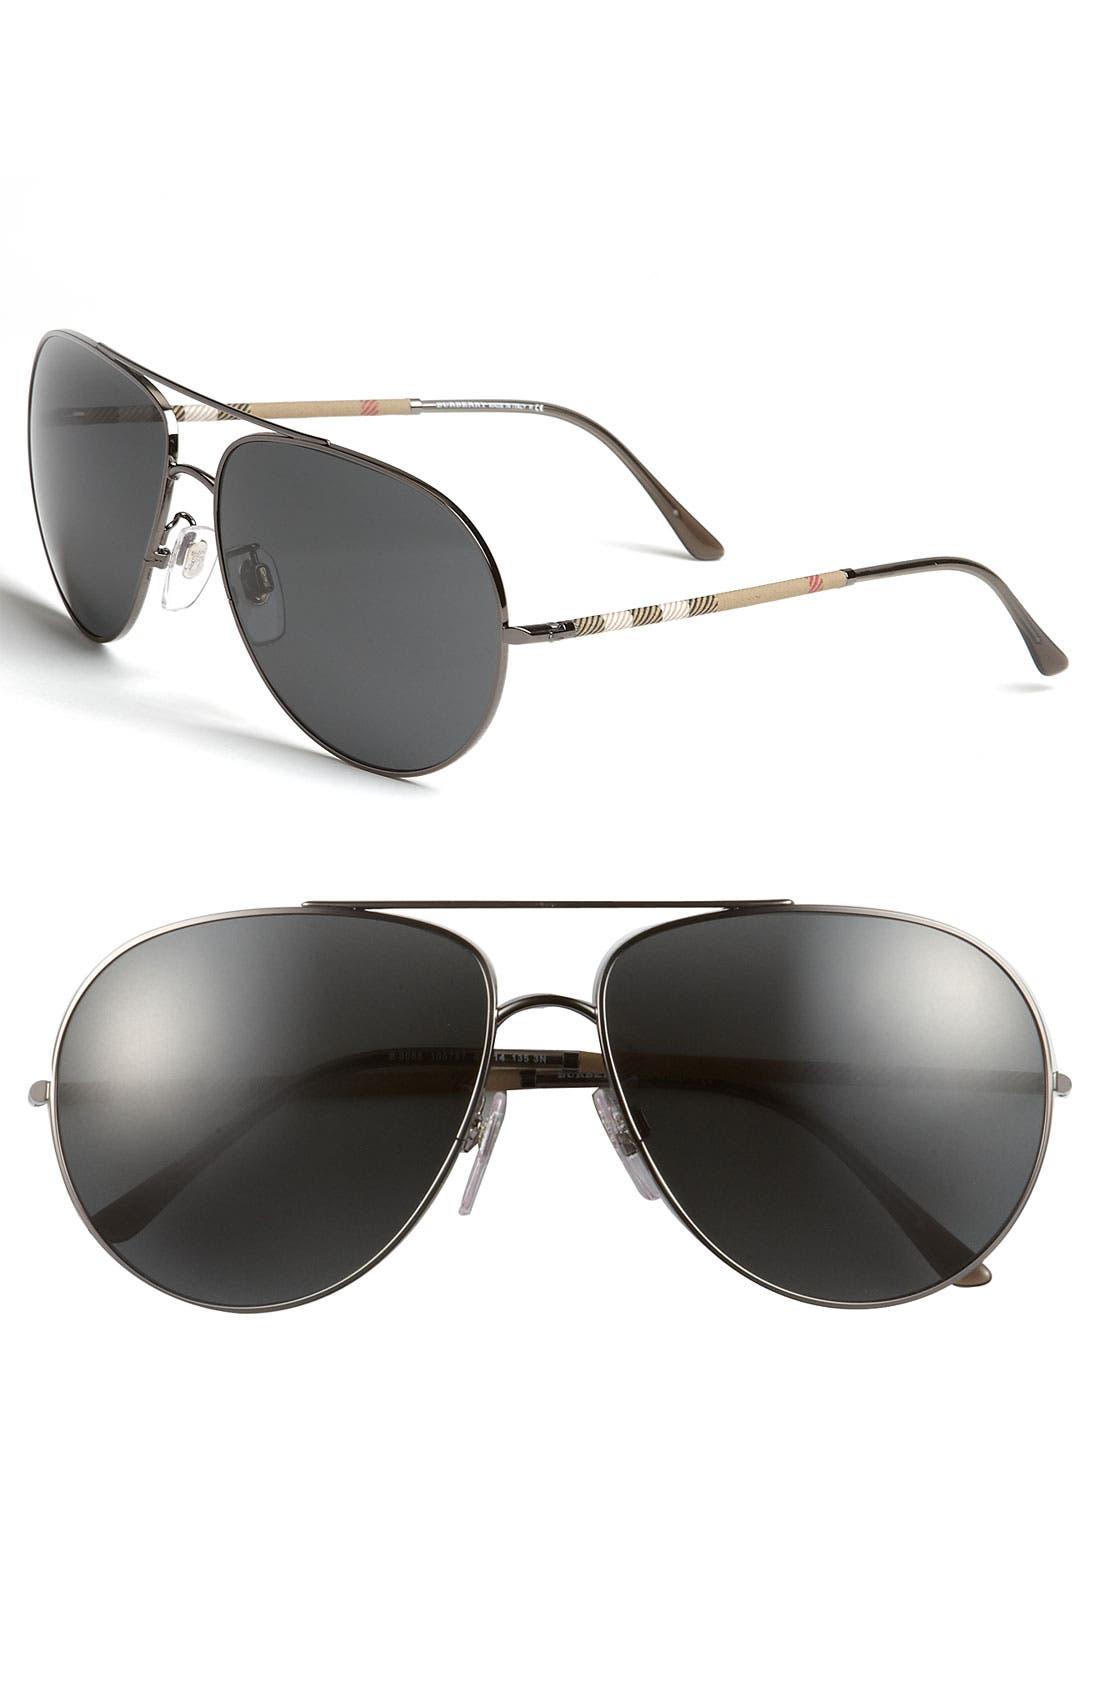 Main Image - Burberry Check Temple Aviator Sunglasses